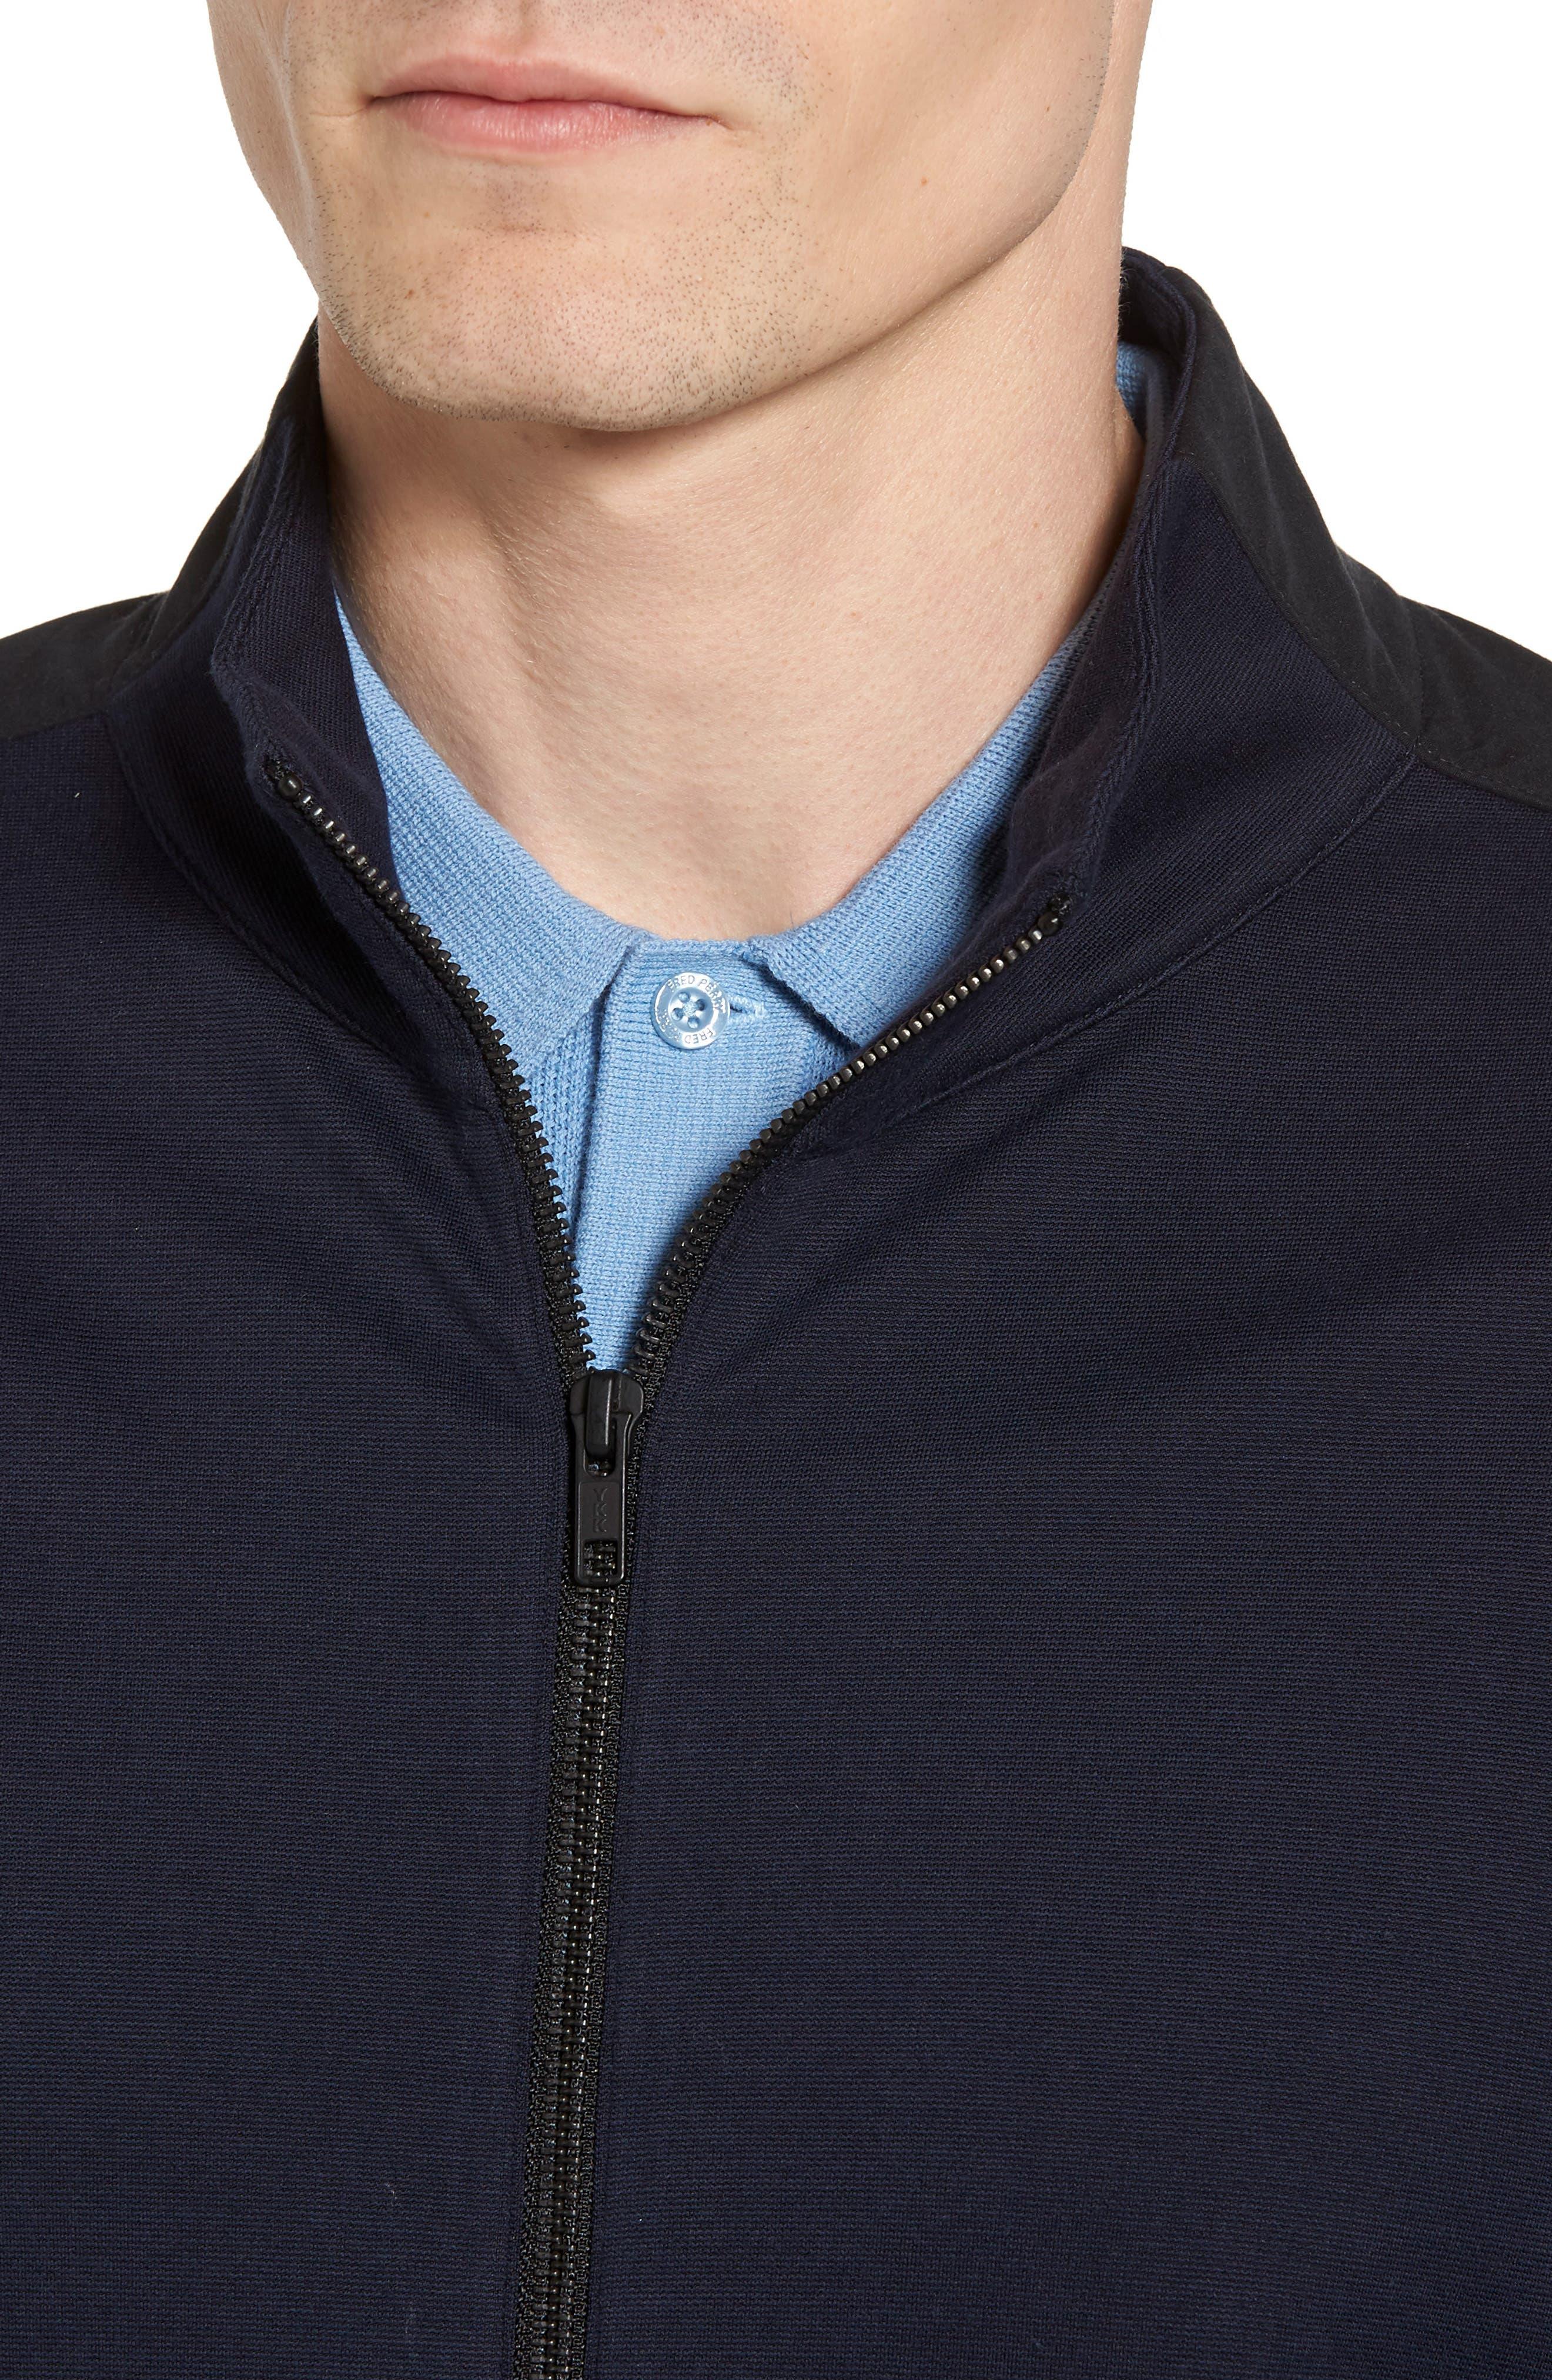 Fleece Jacket,                             Alternate thumbnail 4, color,                             Navy Night Black